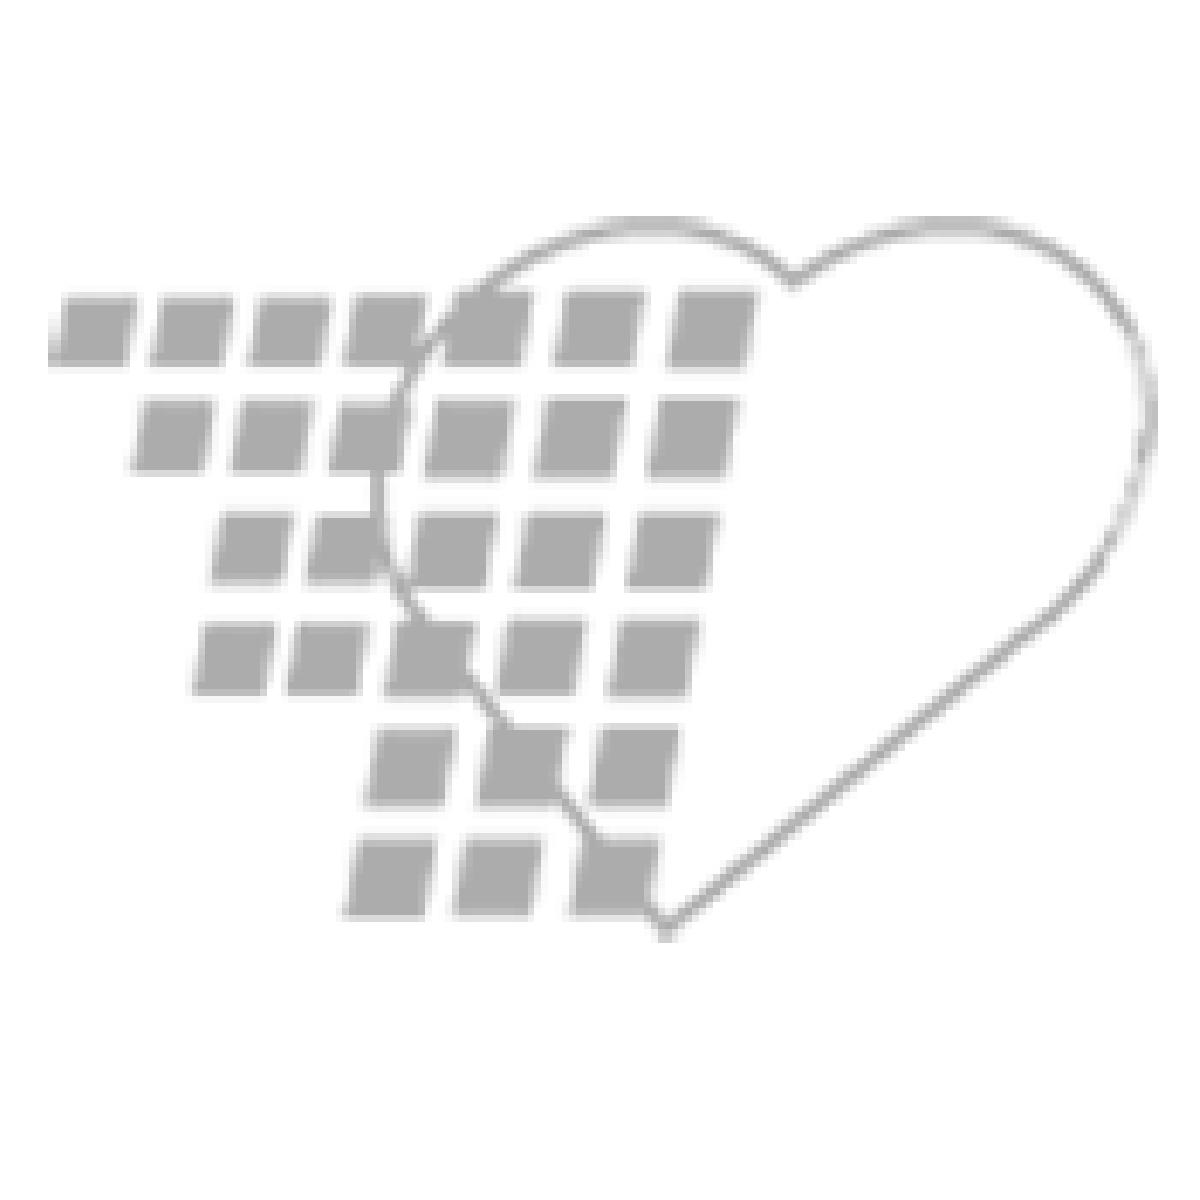 07-44-2020 - King Airways #2 with 30 mL Syringe Kit